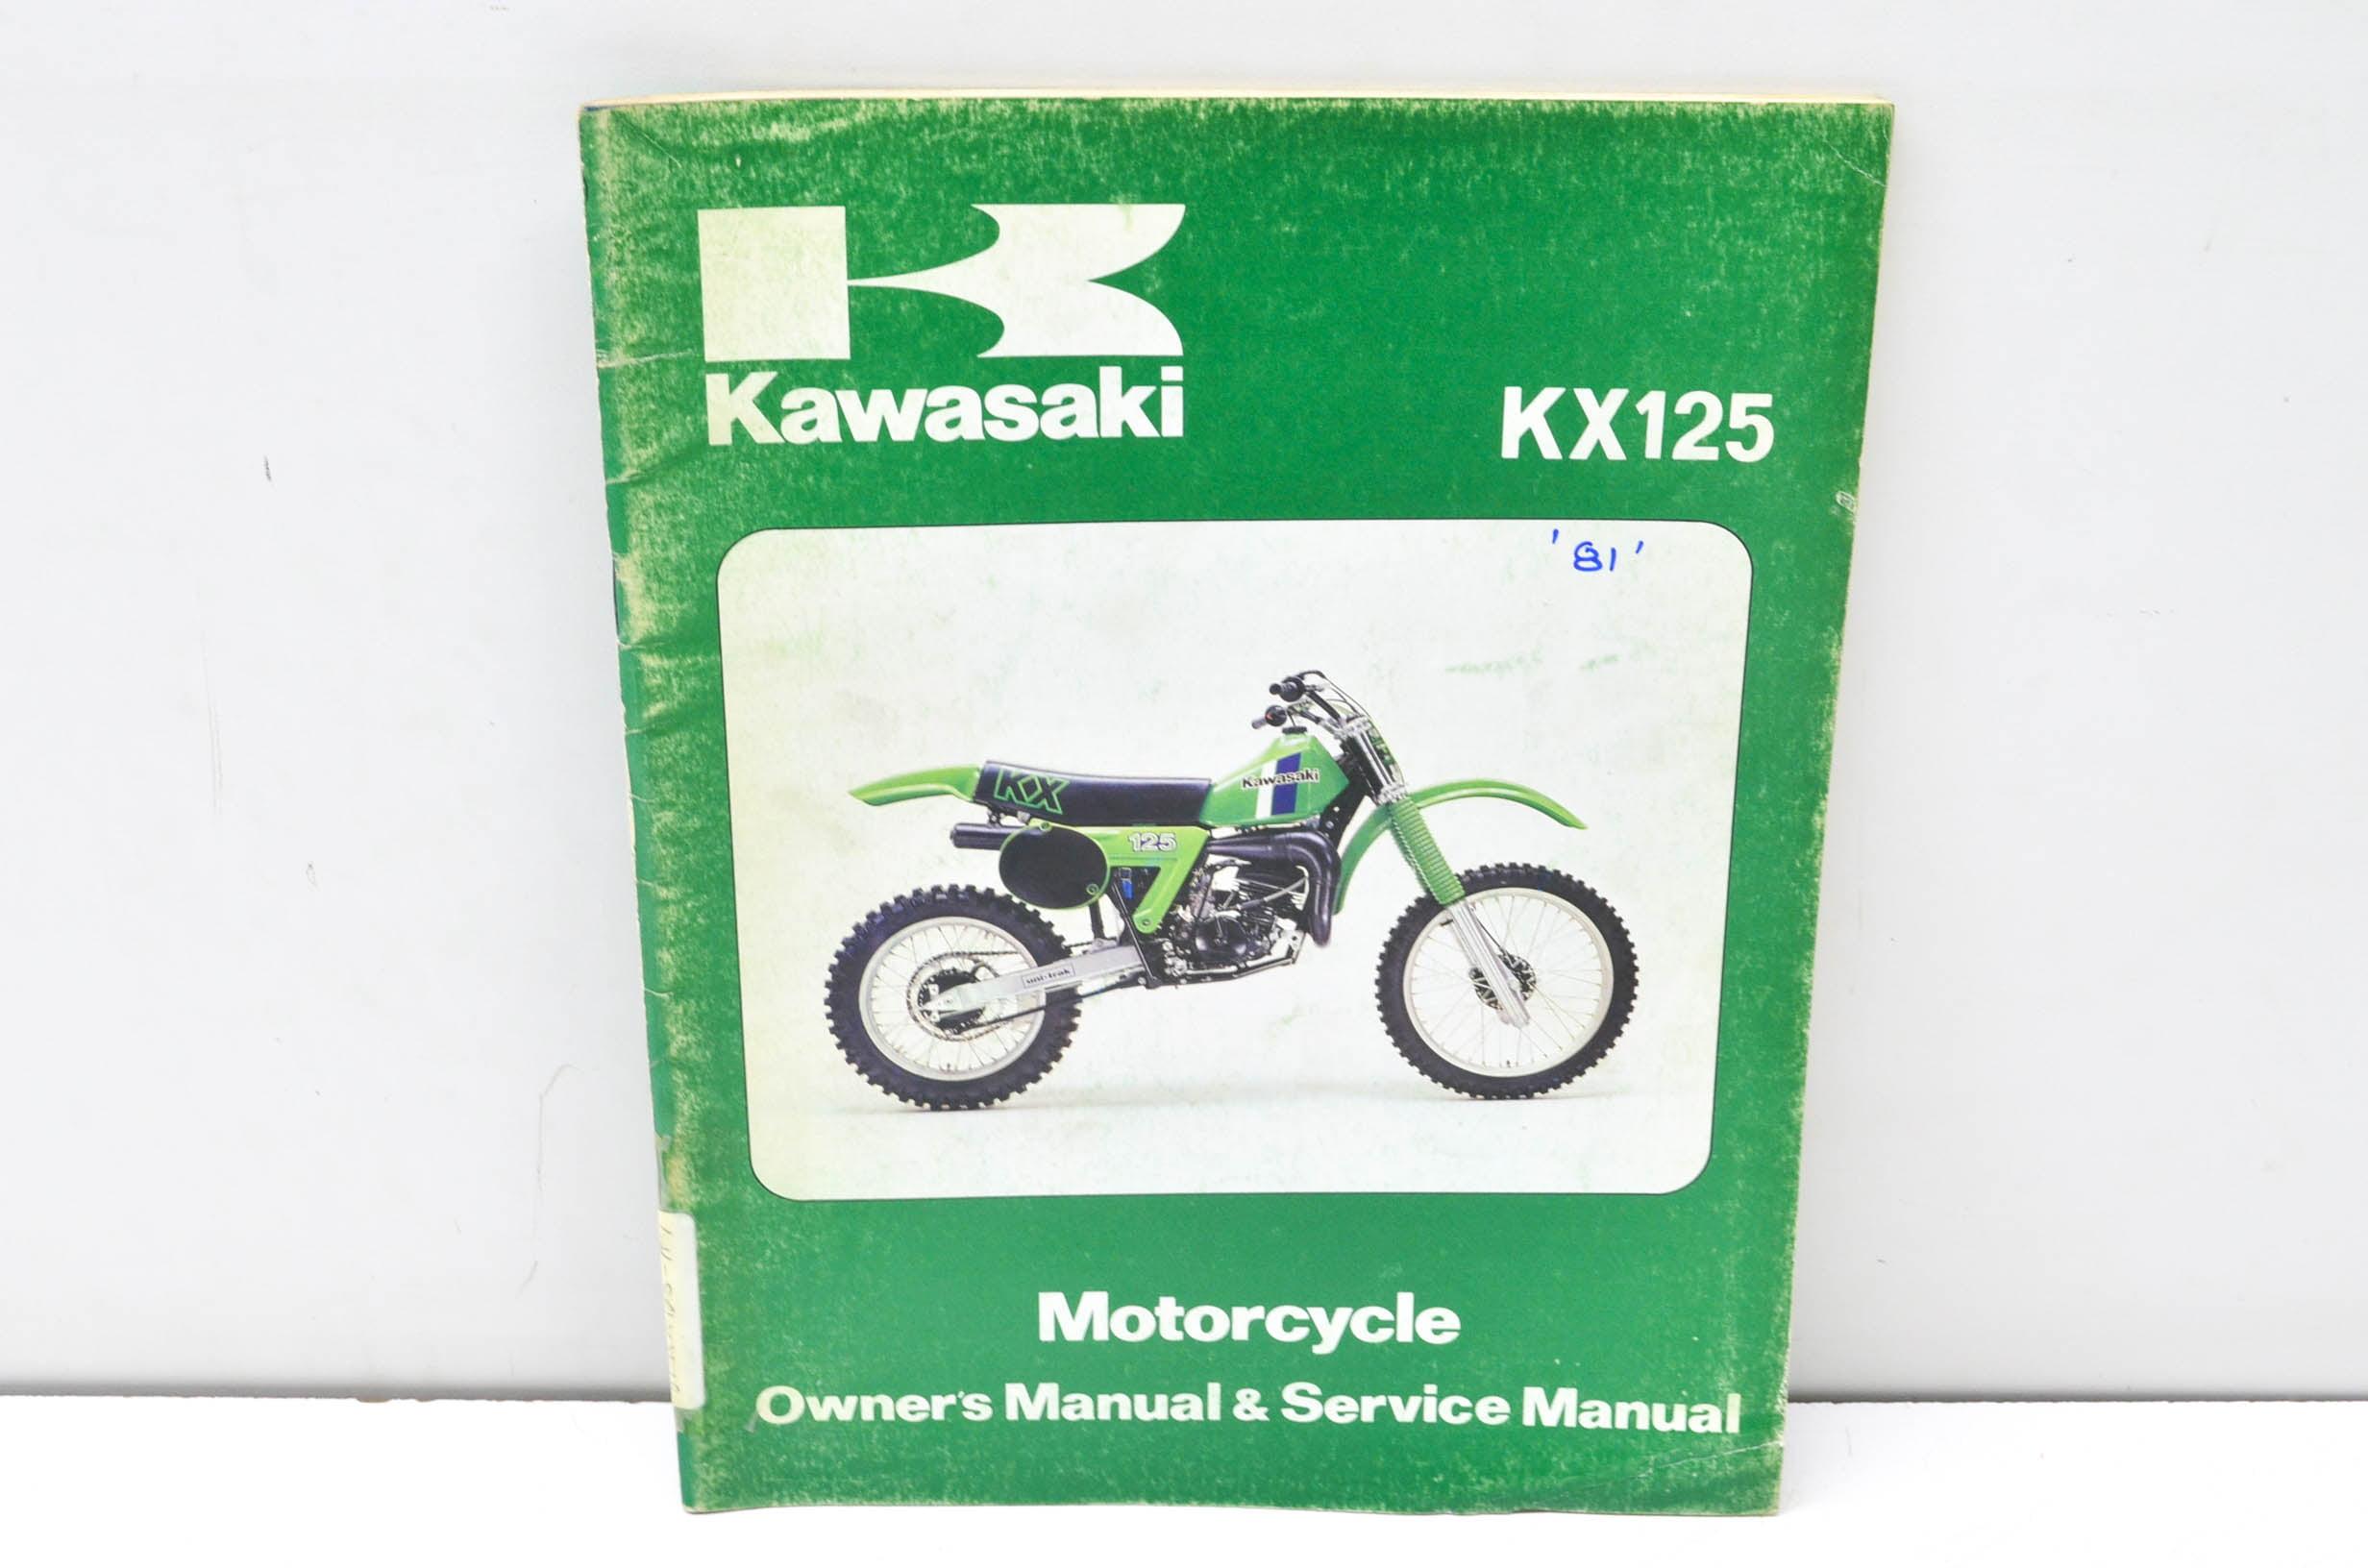 Kawasaki 99920 1123 01 Kx125 Motorcycle Owners Manual Service Kx 125 Wiring Diagram Qty 1